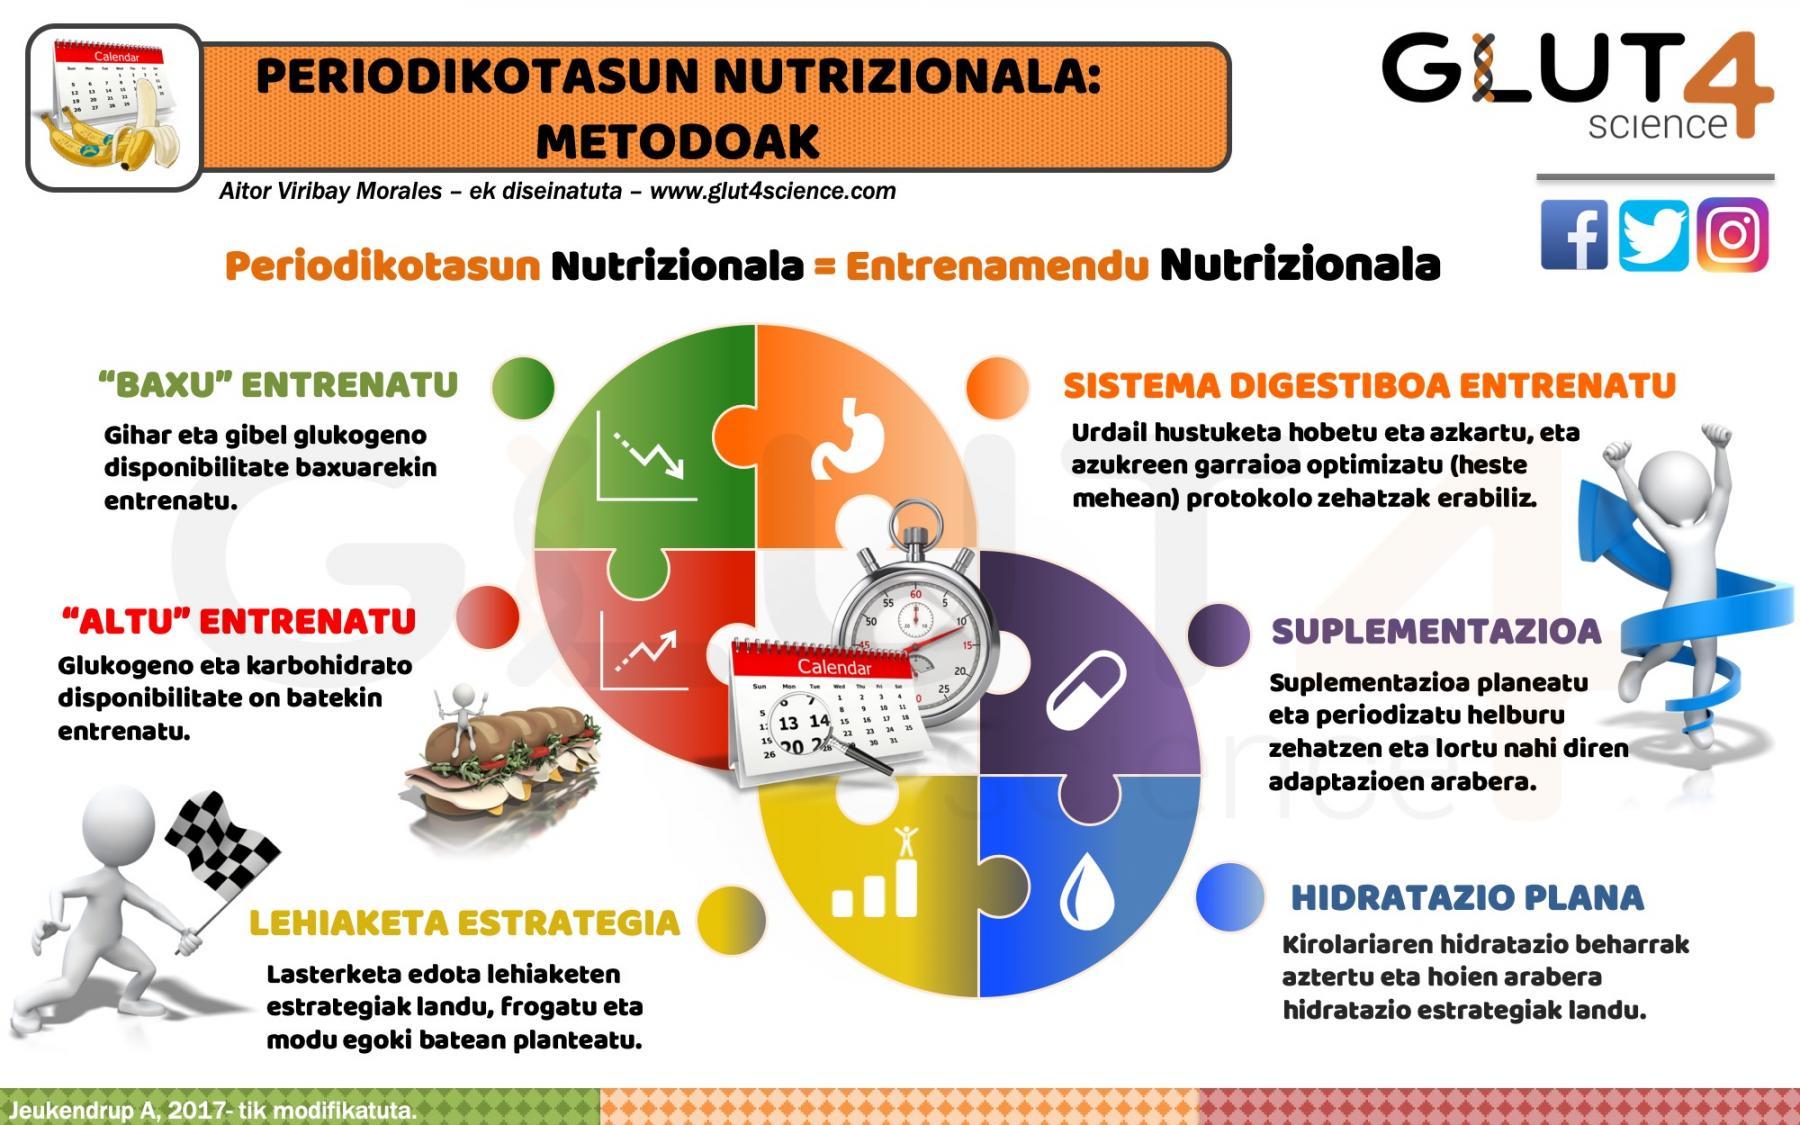 Periodikotasun Nutrizionala Kirolean: Metodoak